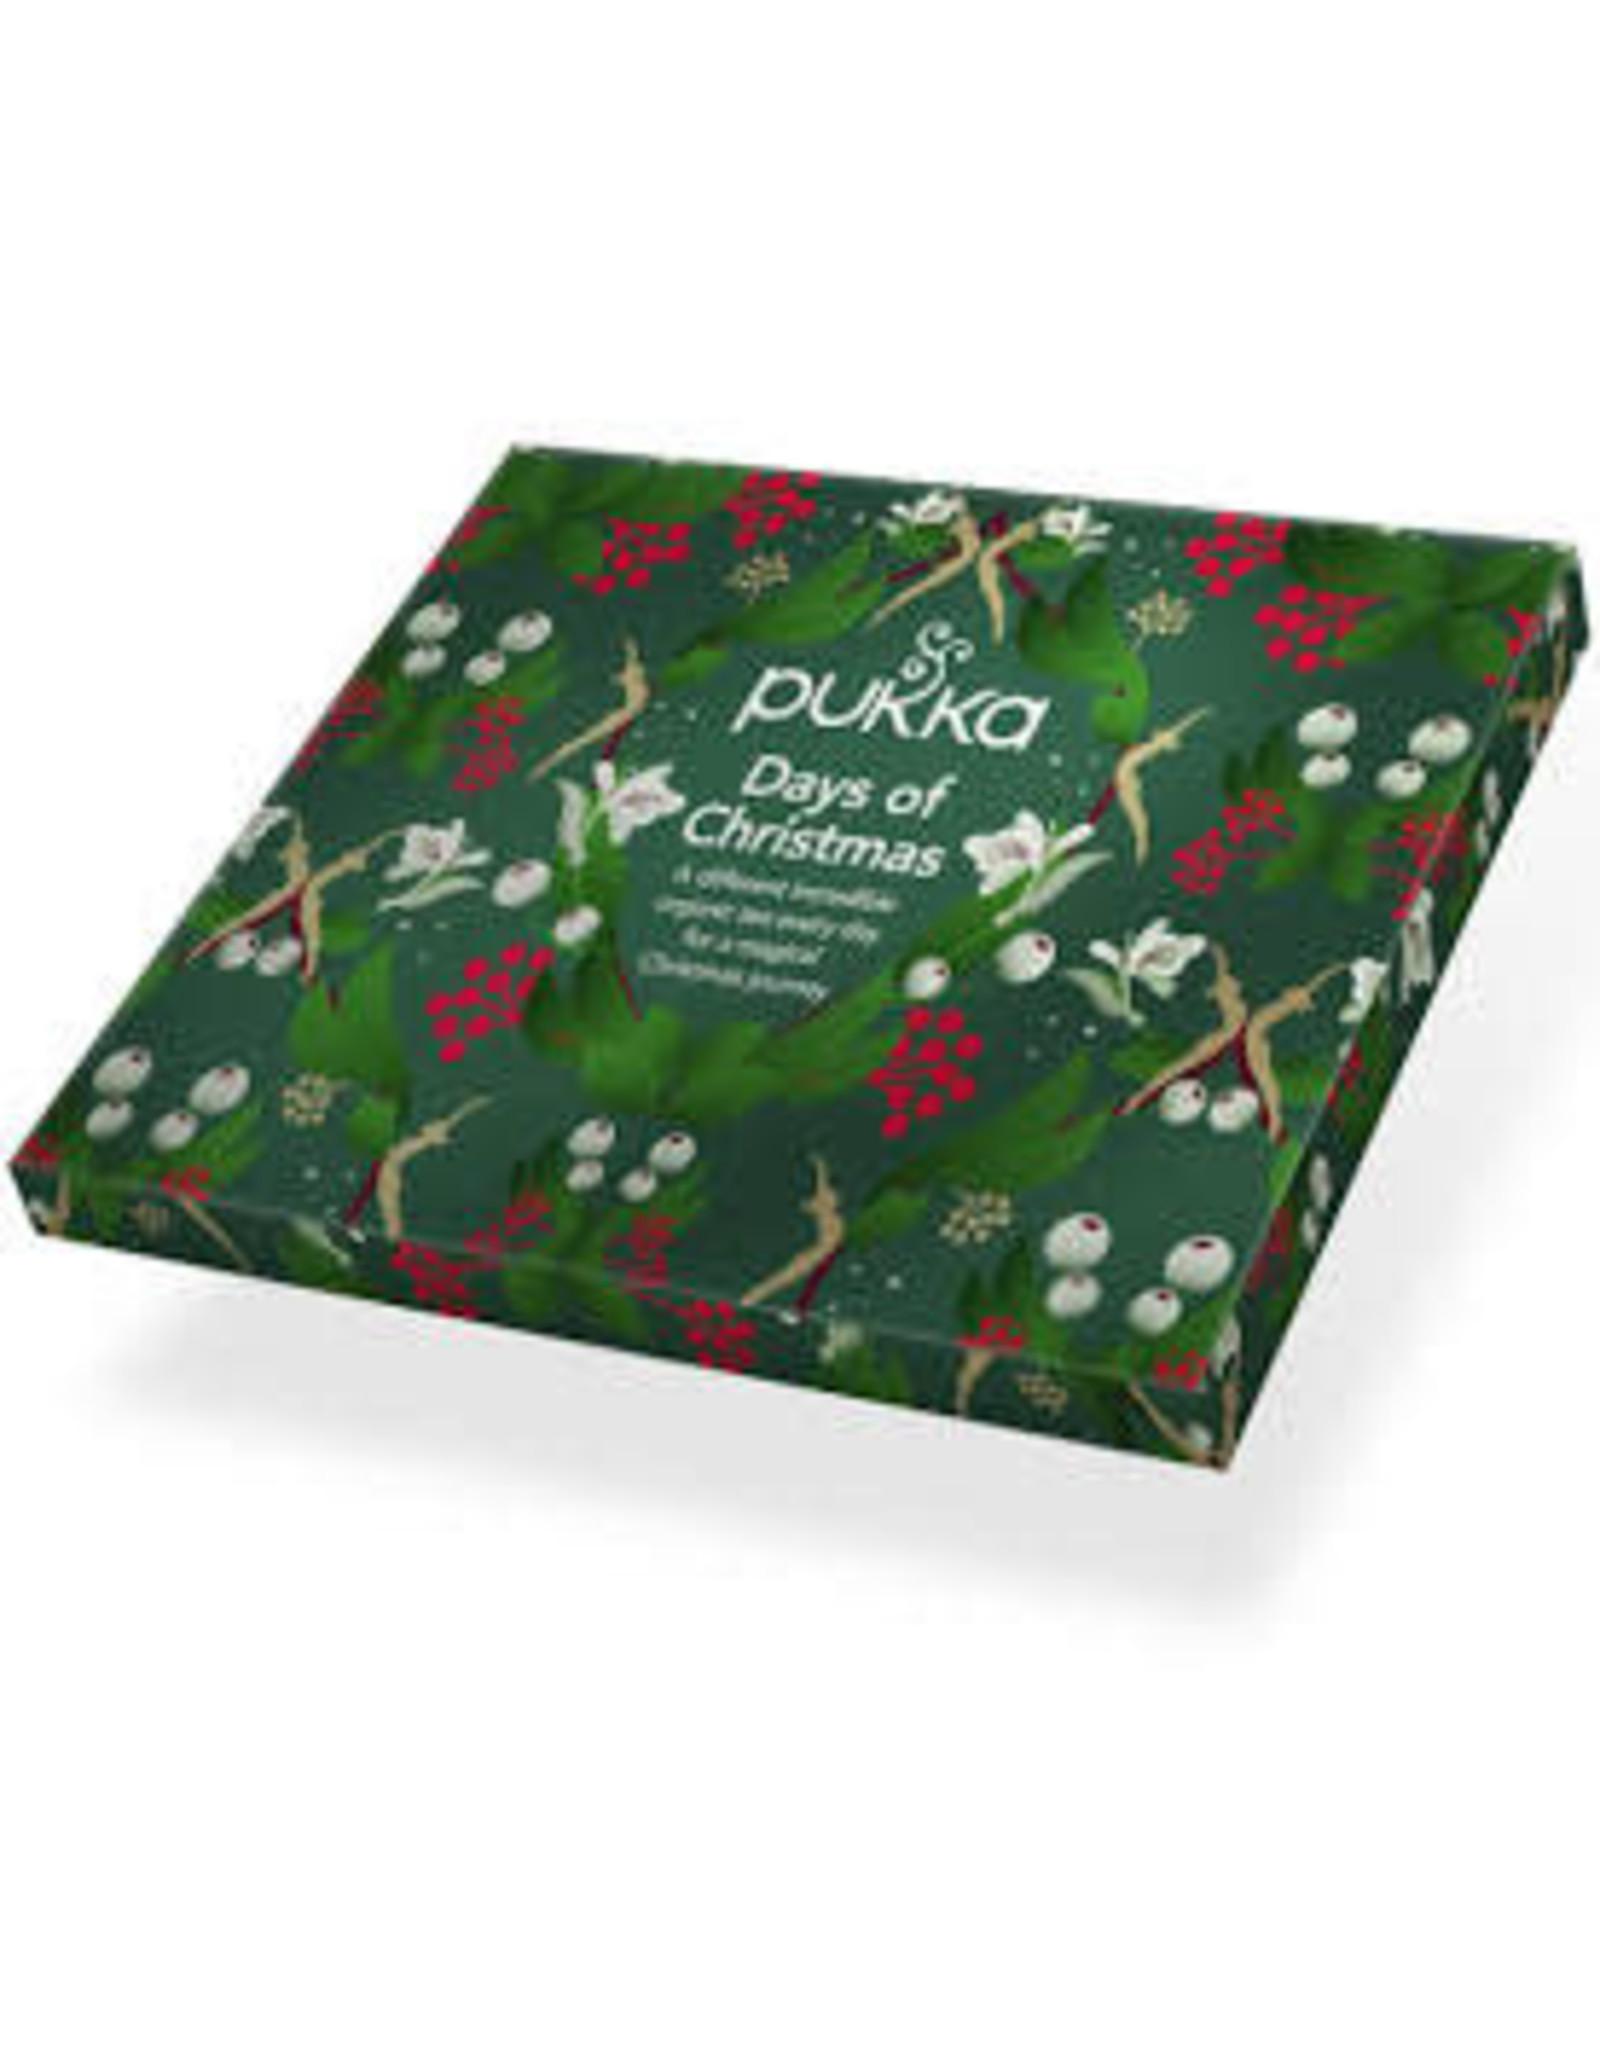 Pukka Christmas Tea Advent Calendar